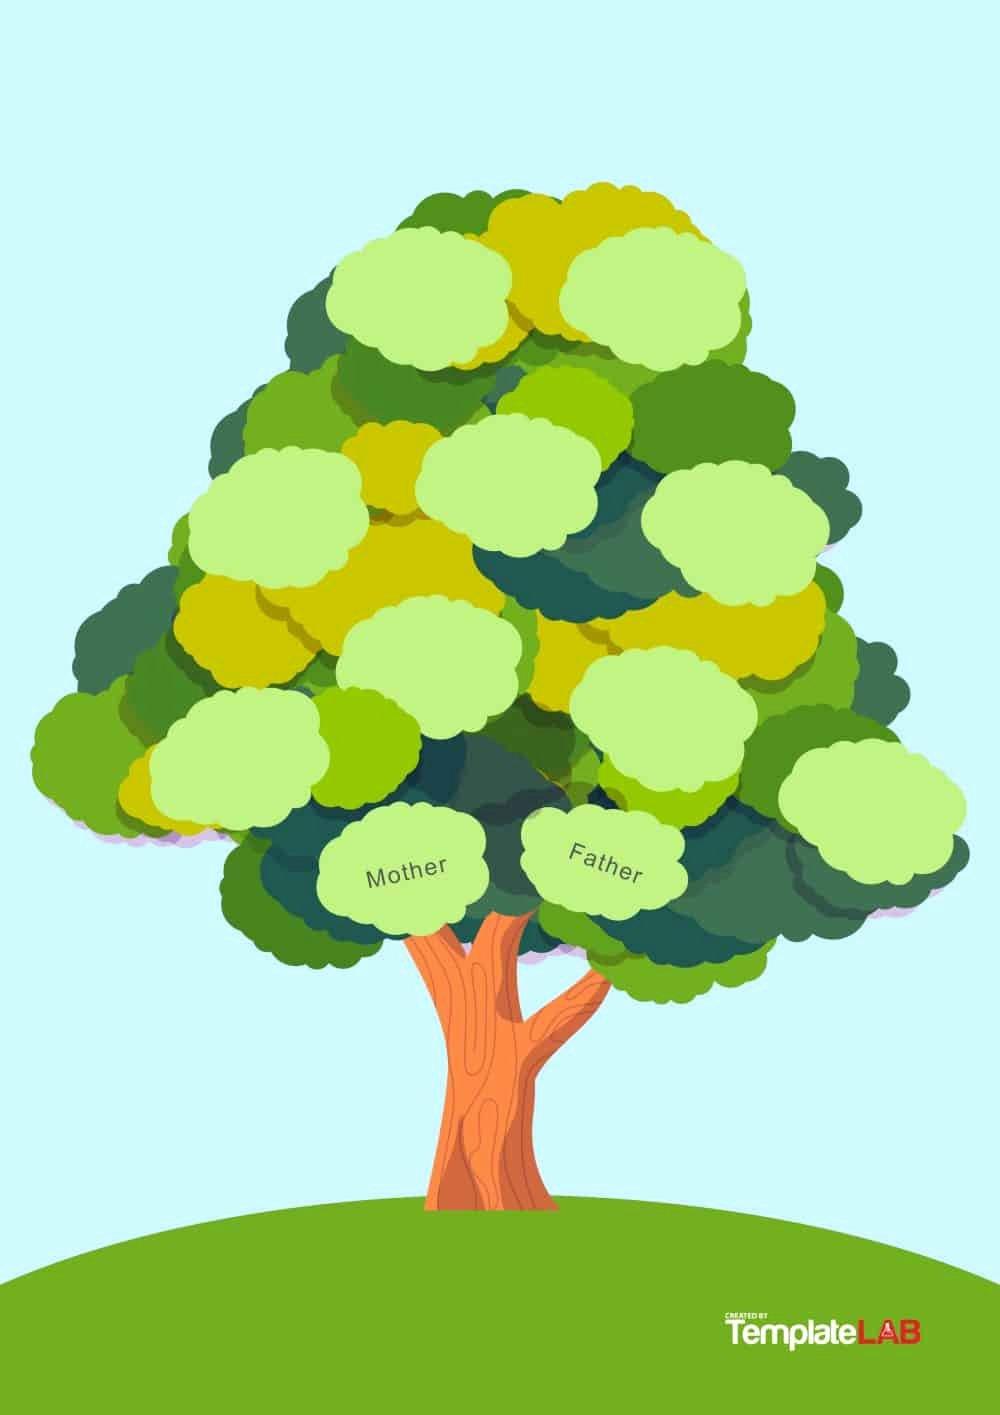 Free Family Tree Template Excel Elegant 50 Free Family Tree Templates Word Excel Pdf